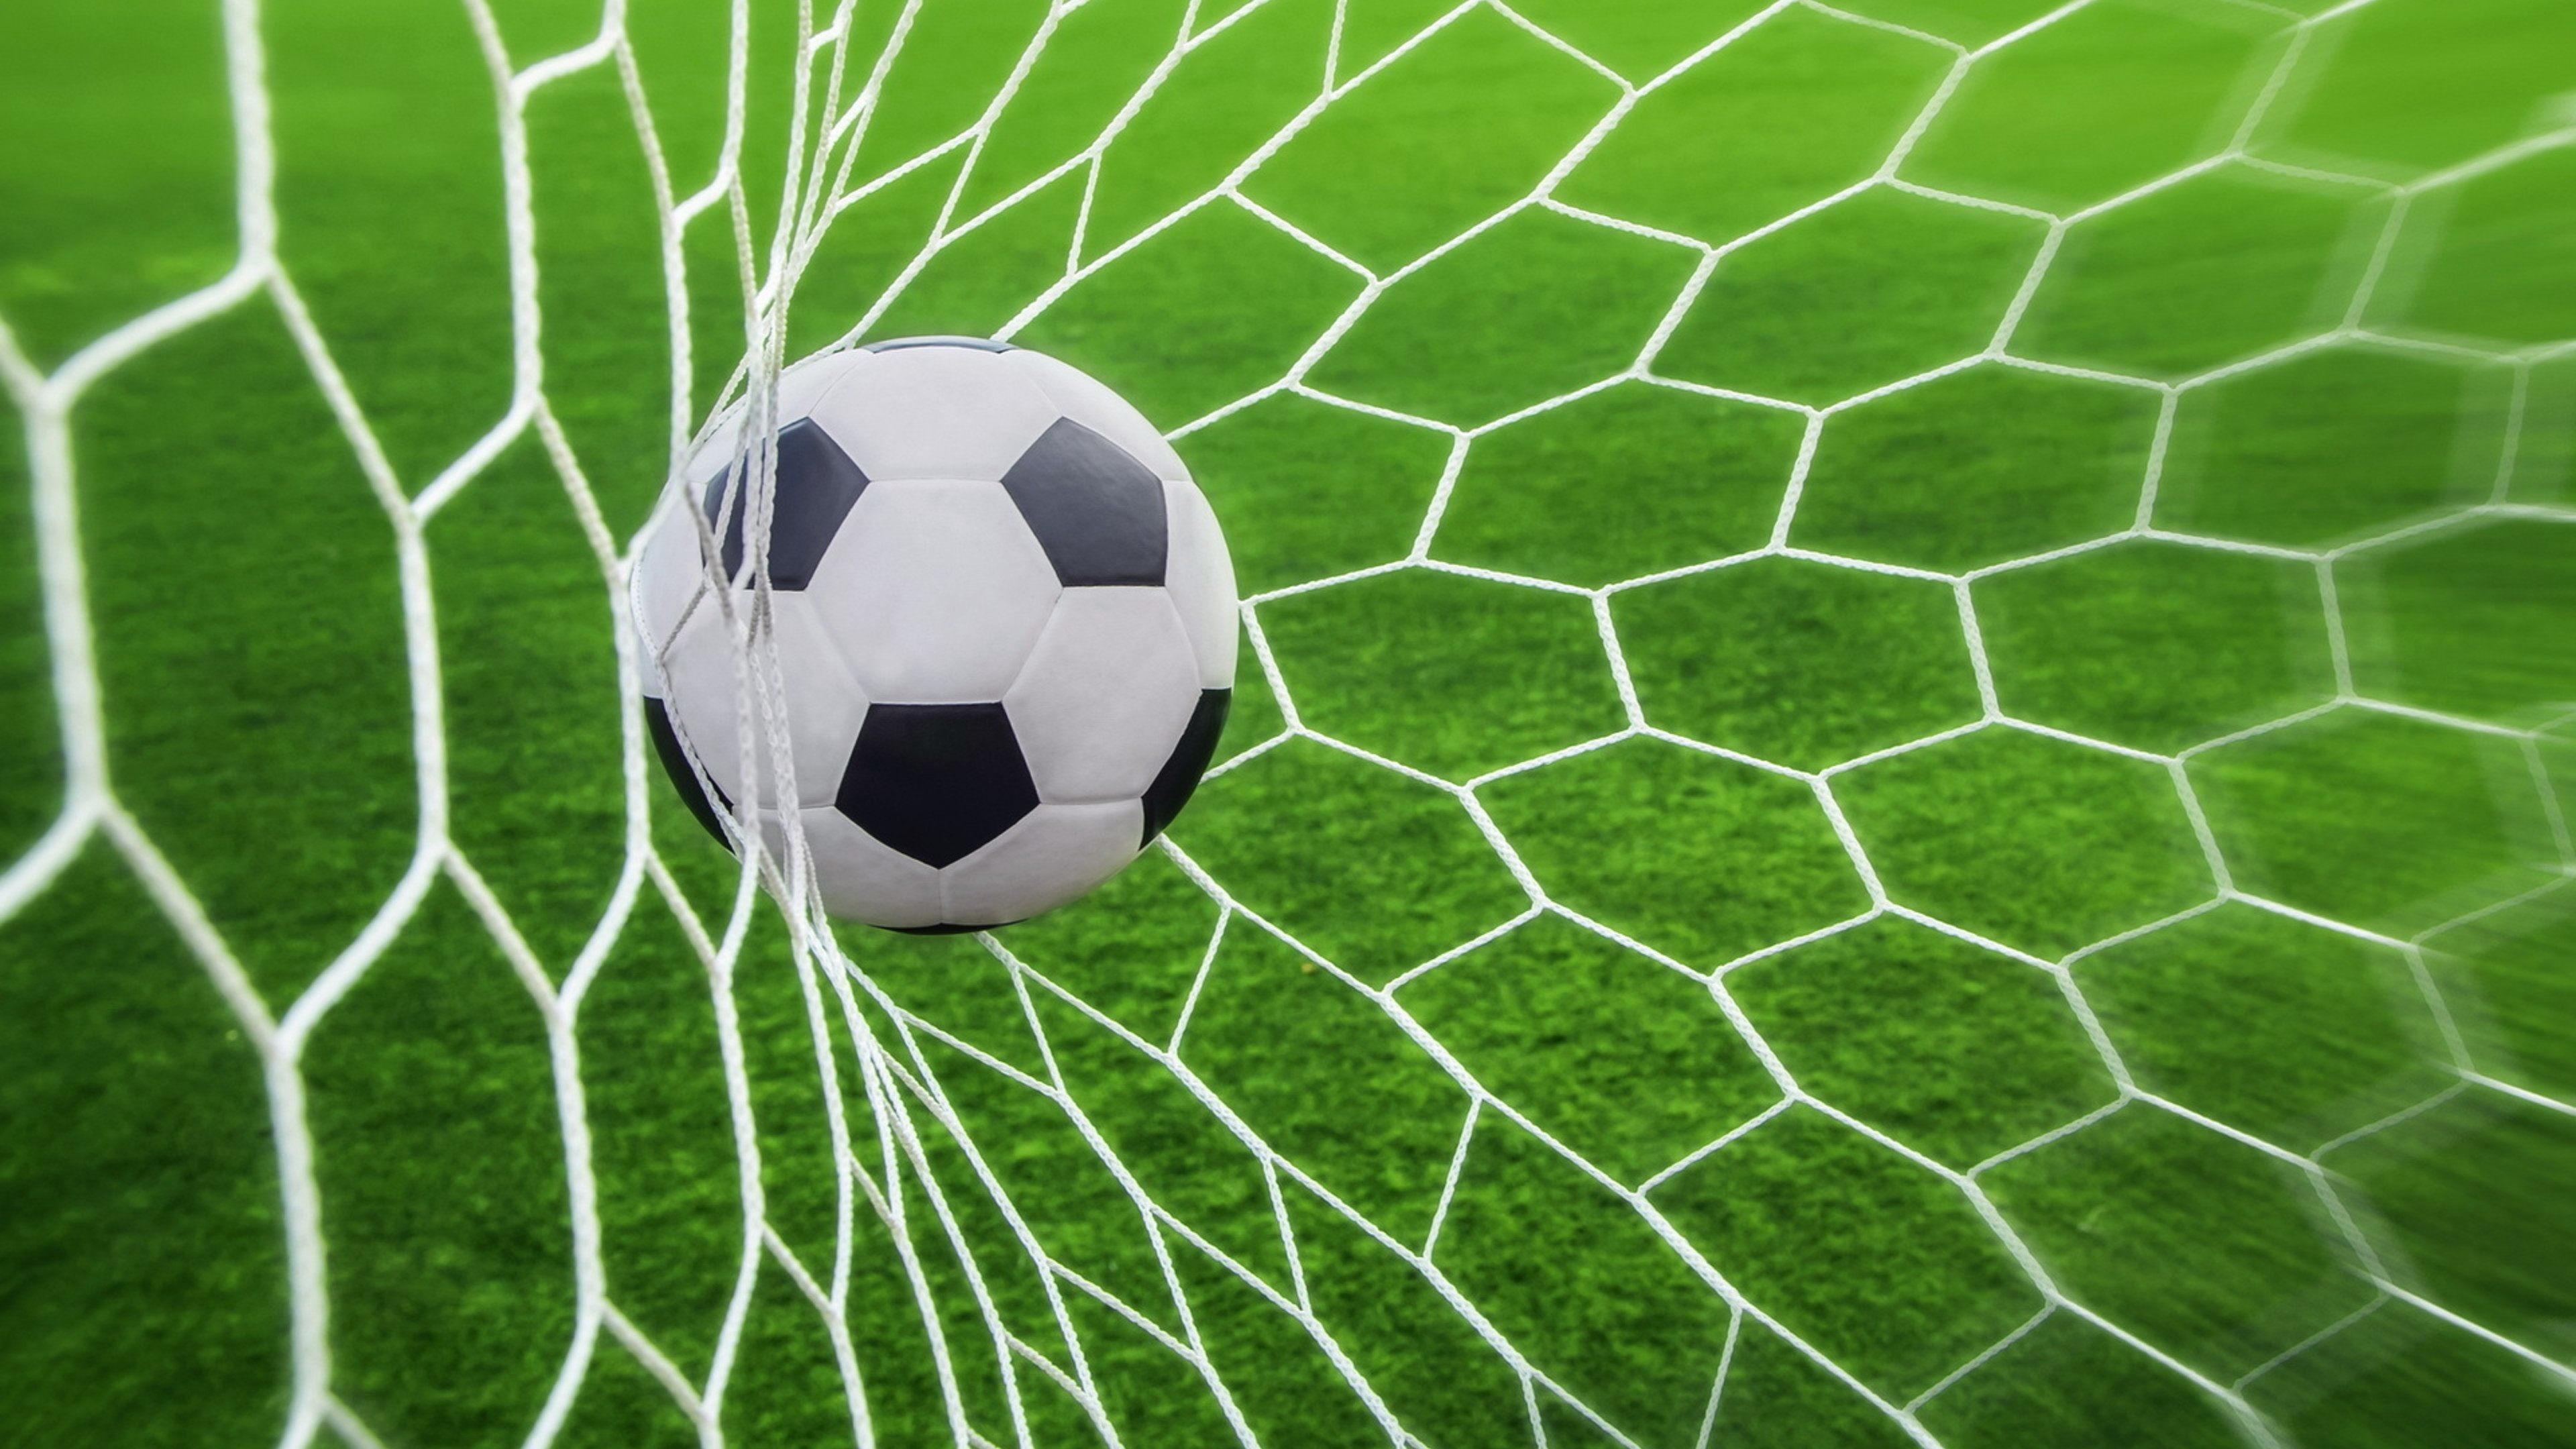 Football Stadium Soccer Pitch Wallpaper HD For Desktop